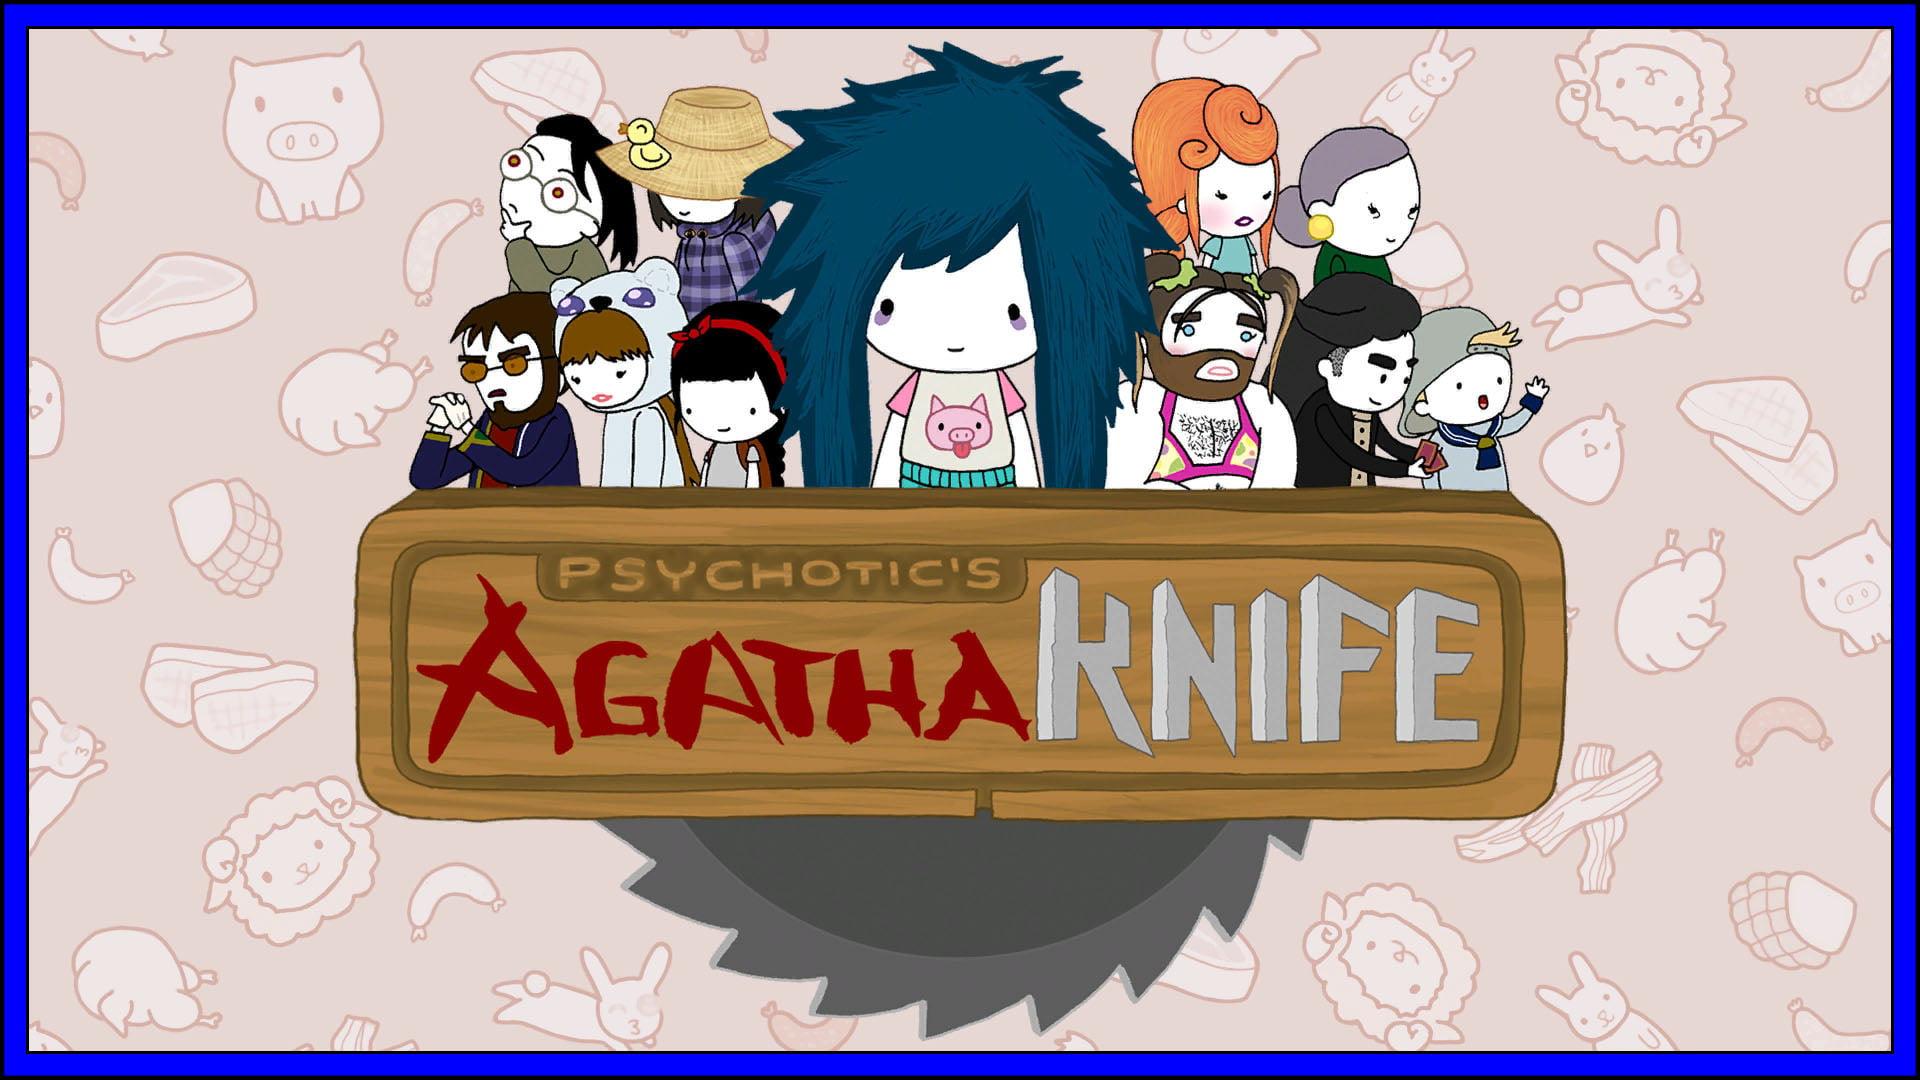 Psychotic's Agatha Knife Fi3